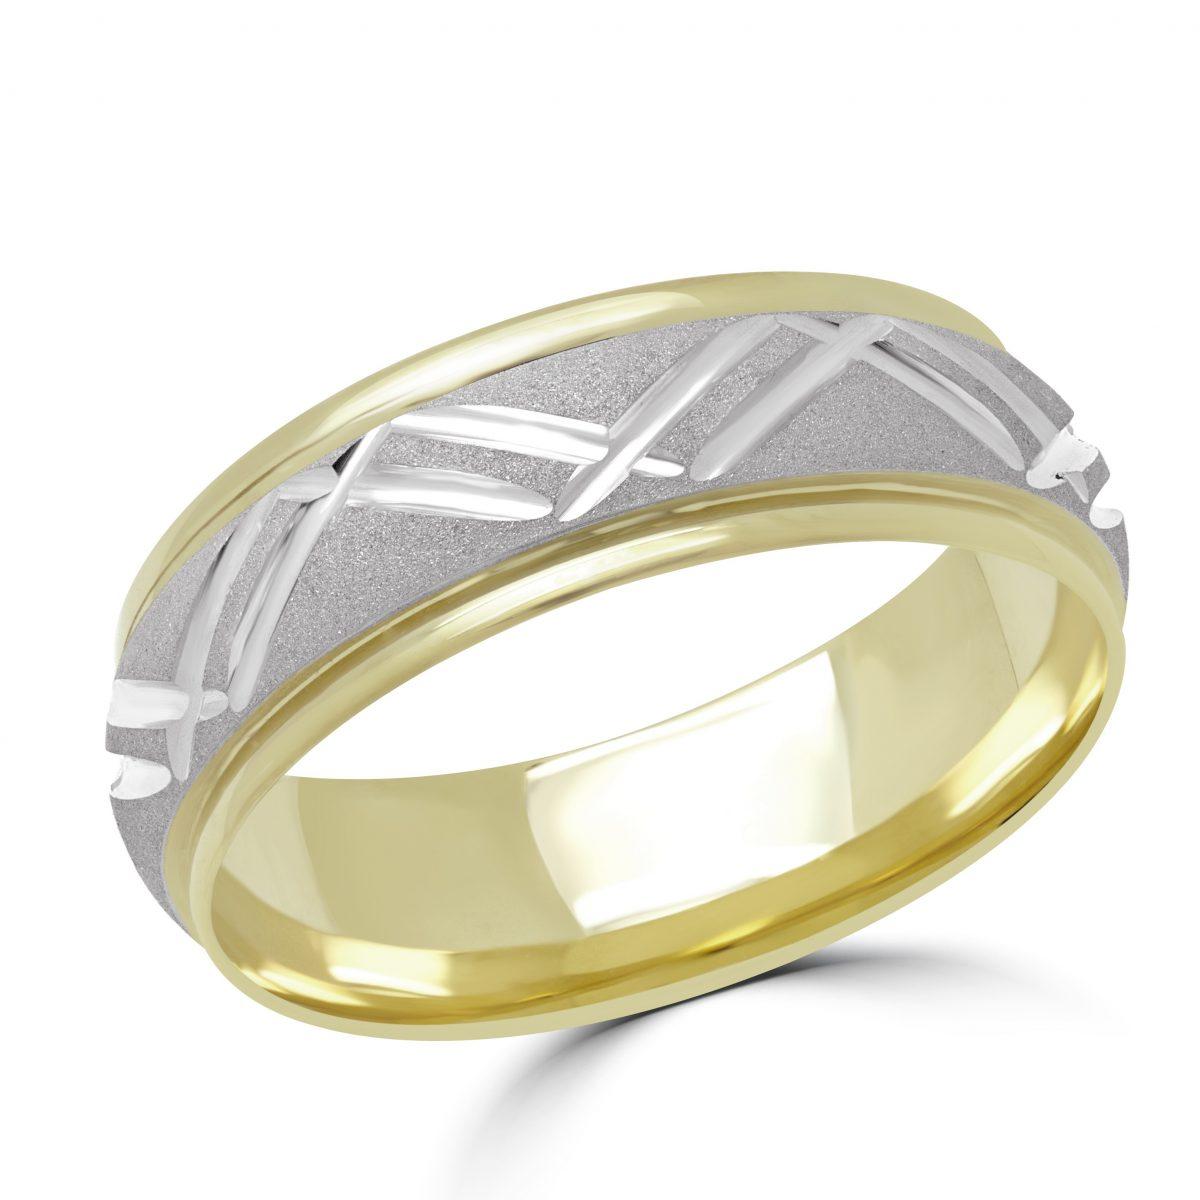 Wedding Band 10k Yellow And White Gold